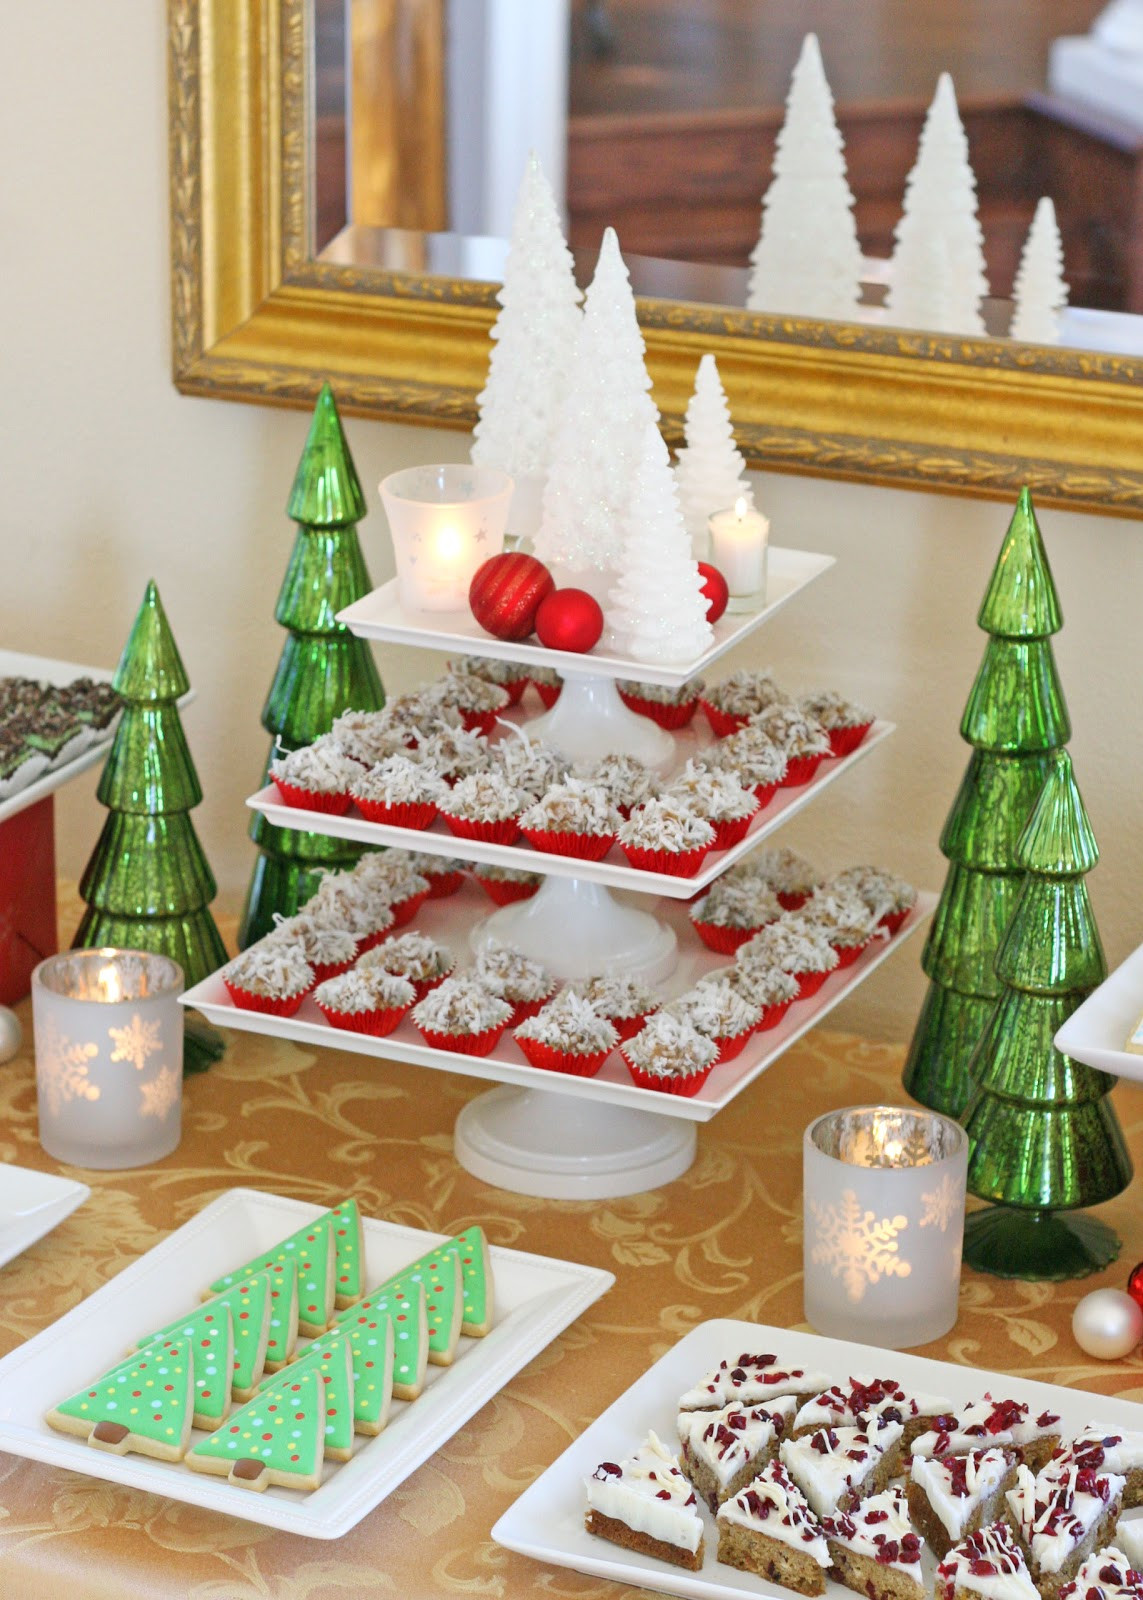 Pretty Christmas Desserts  Classic Holiday Dessert Table Glorious Treats